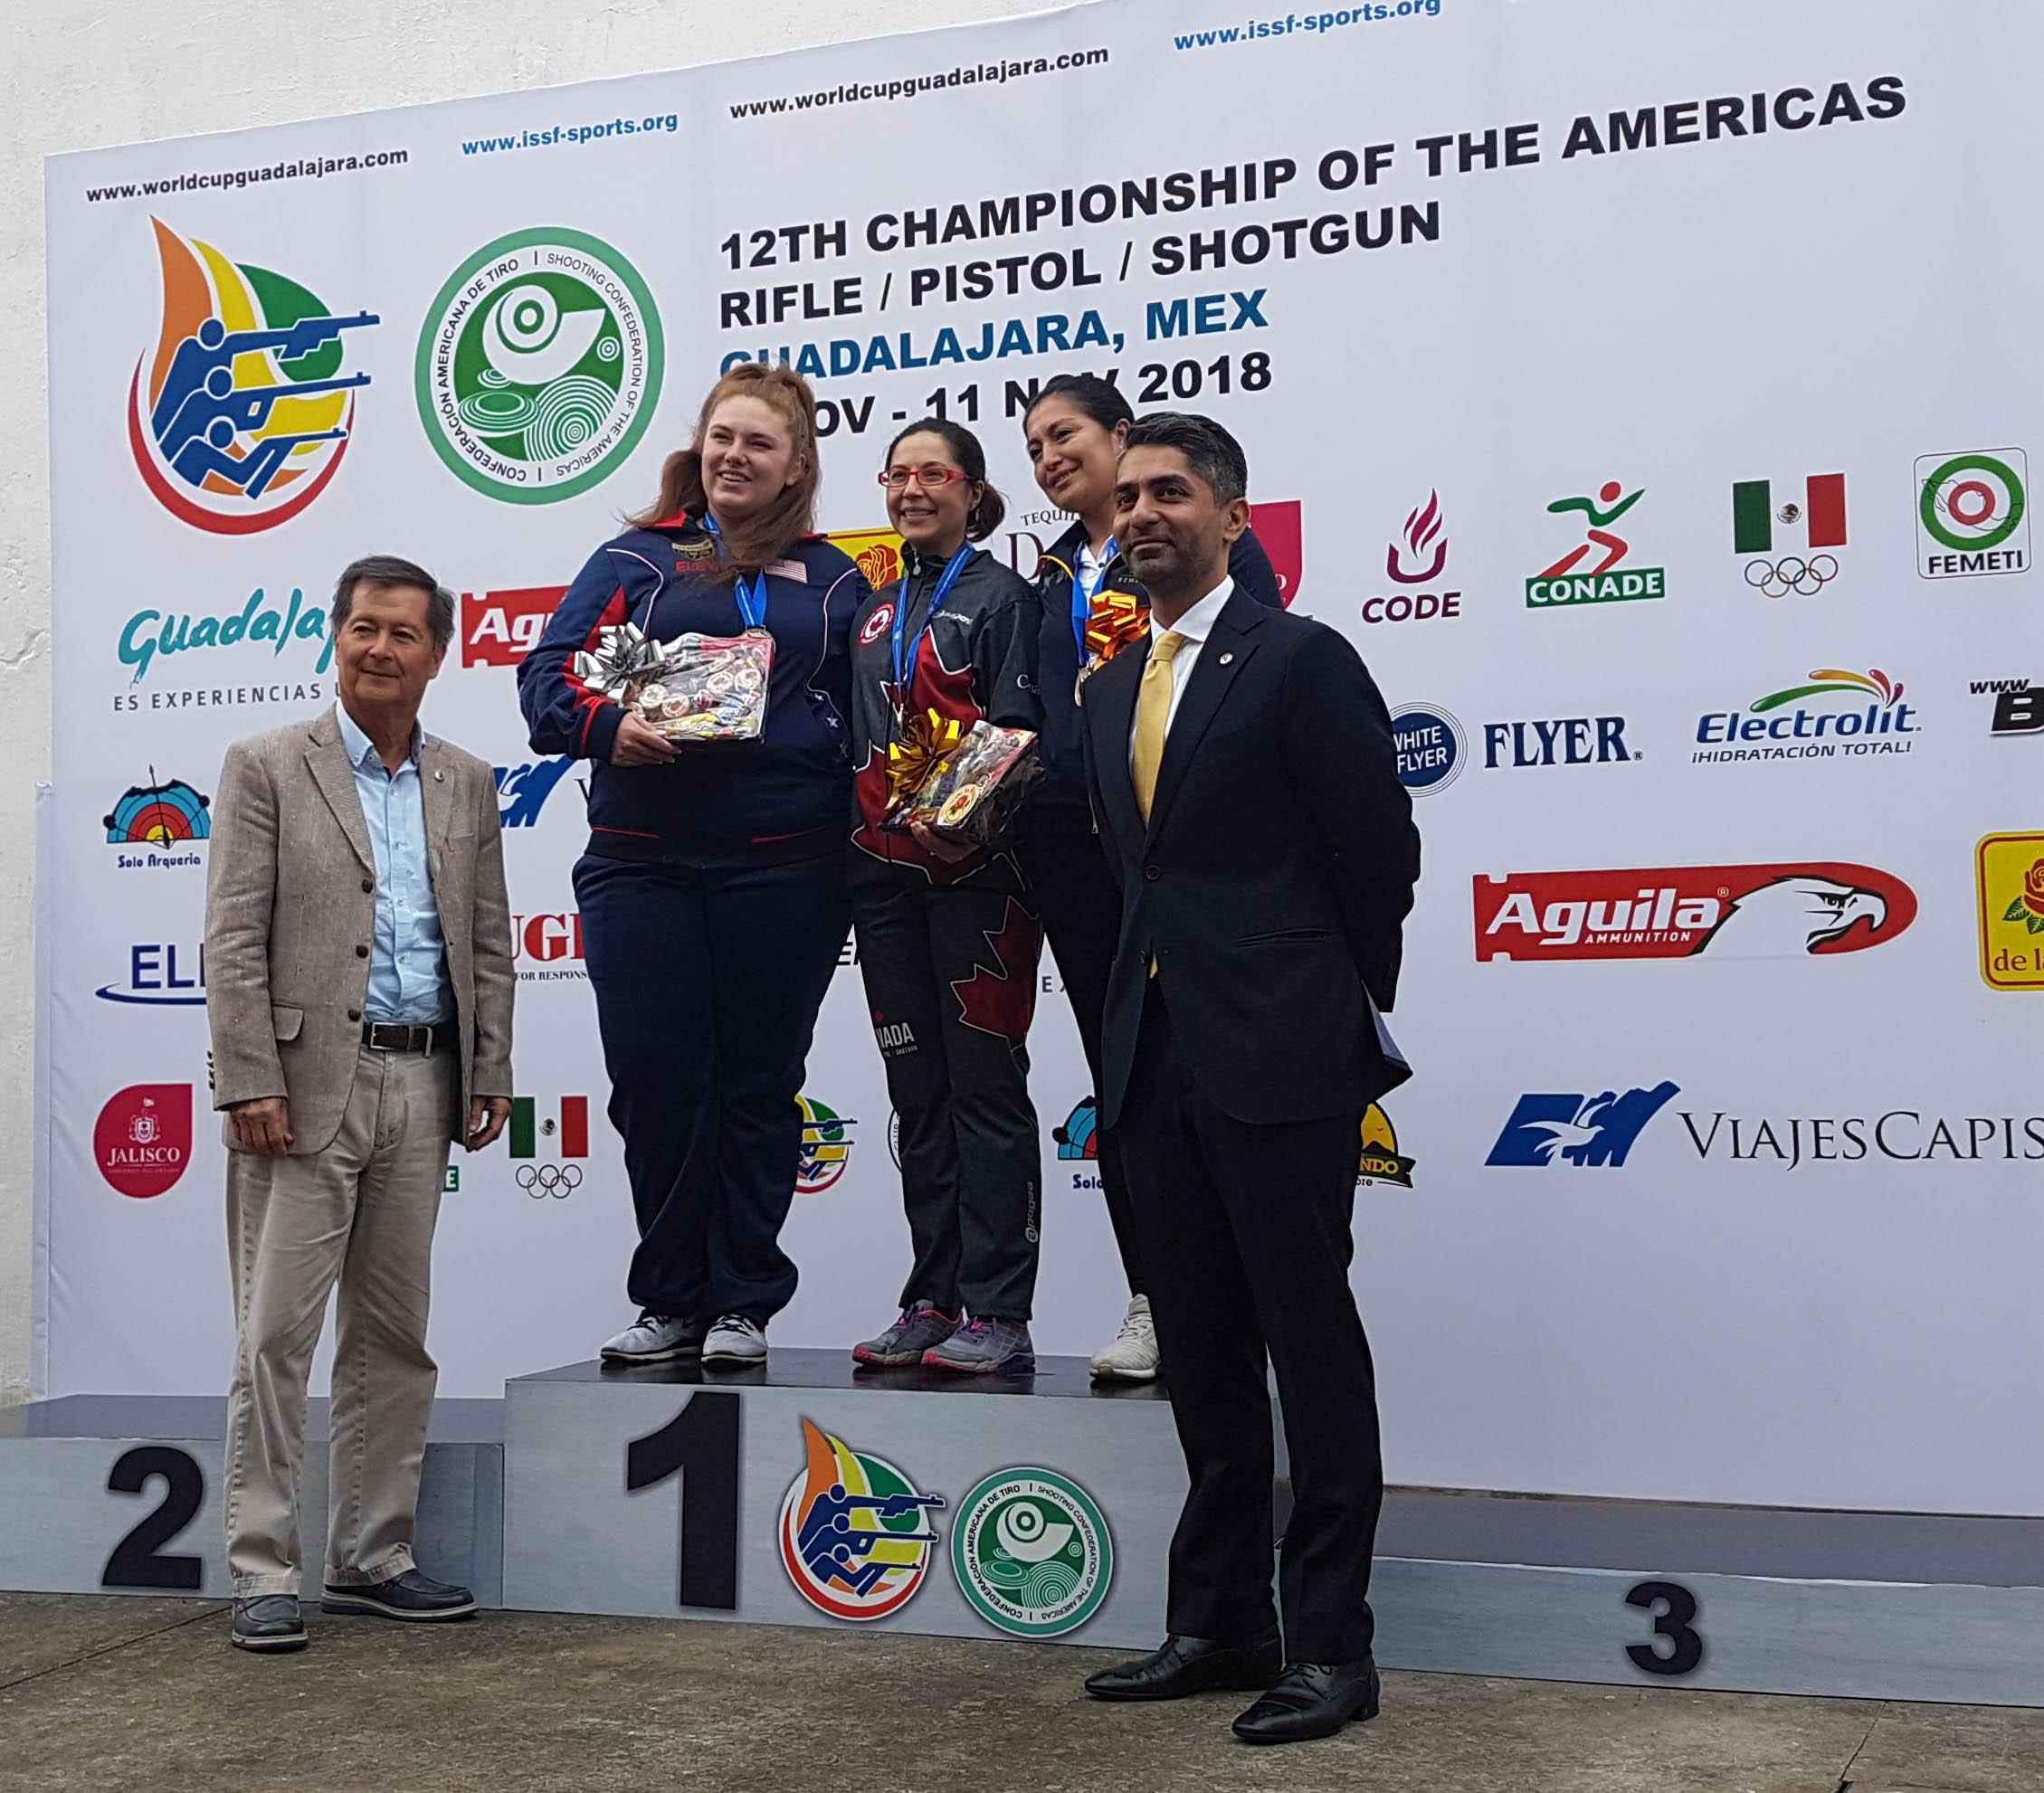 LyndaKiejko2018CATgames_10mGold-podium_w.jpg